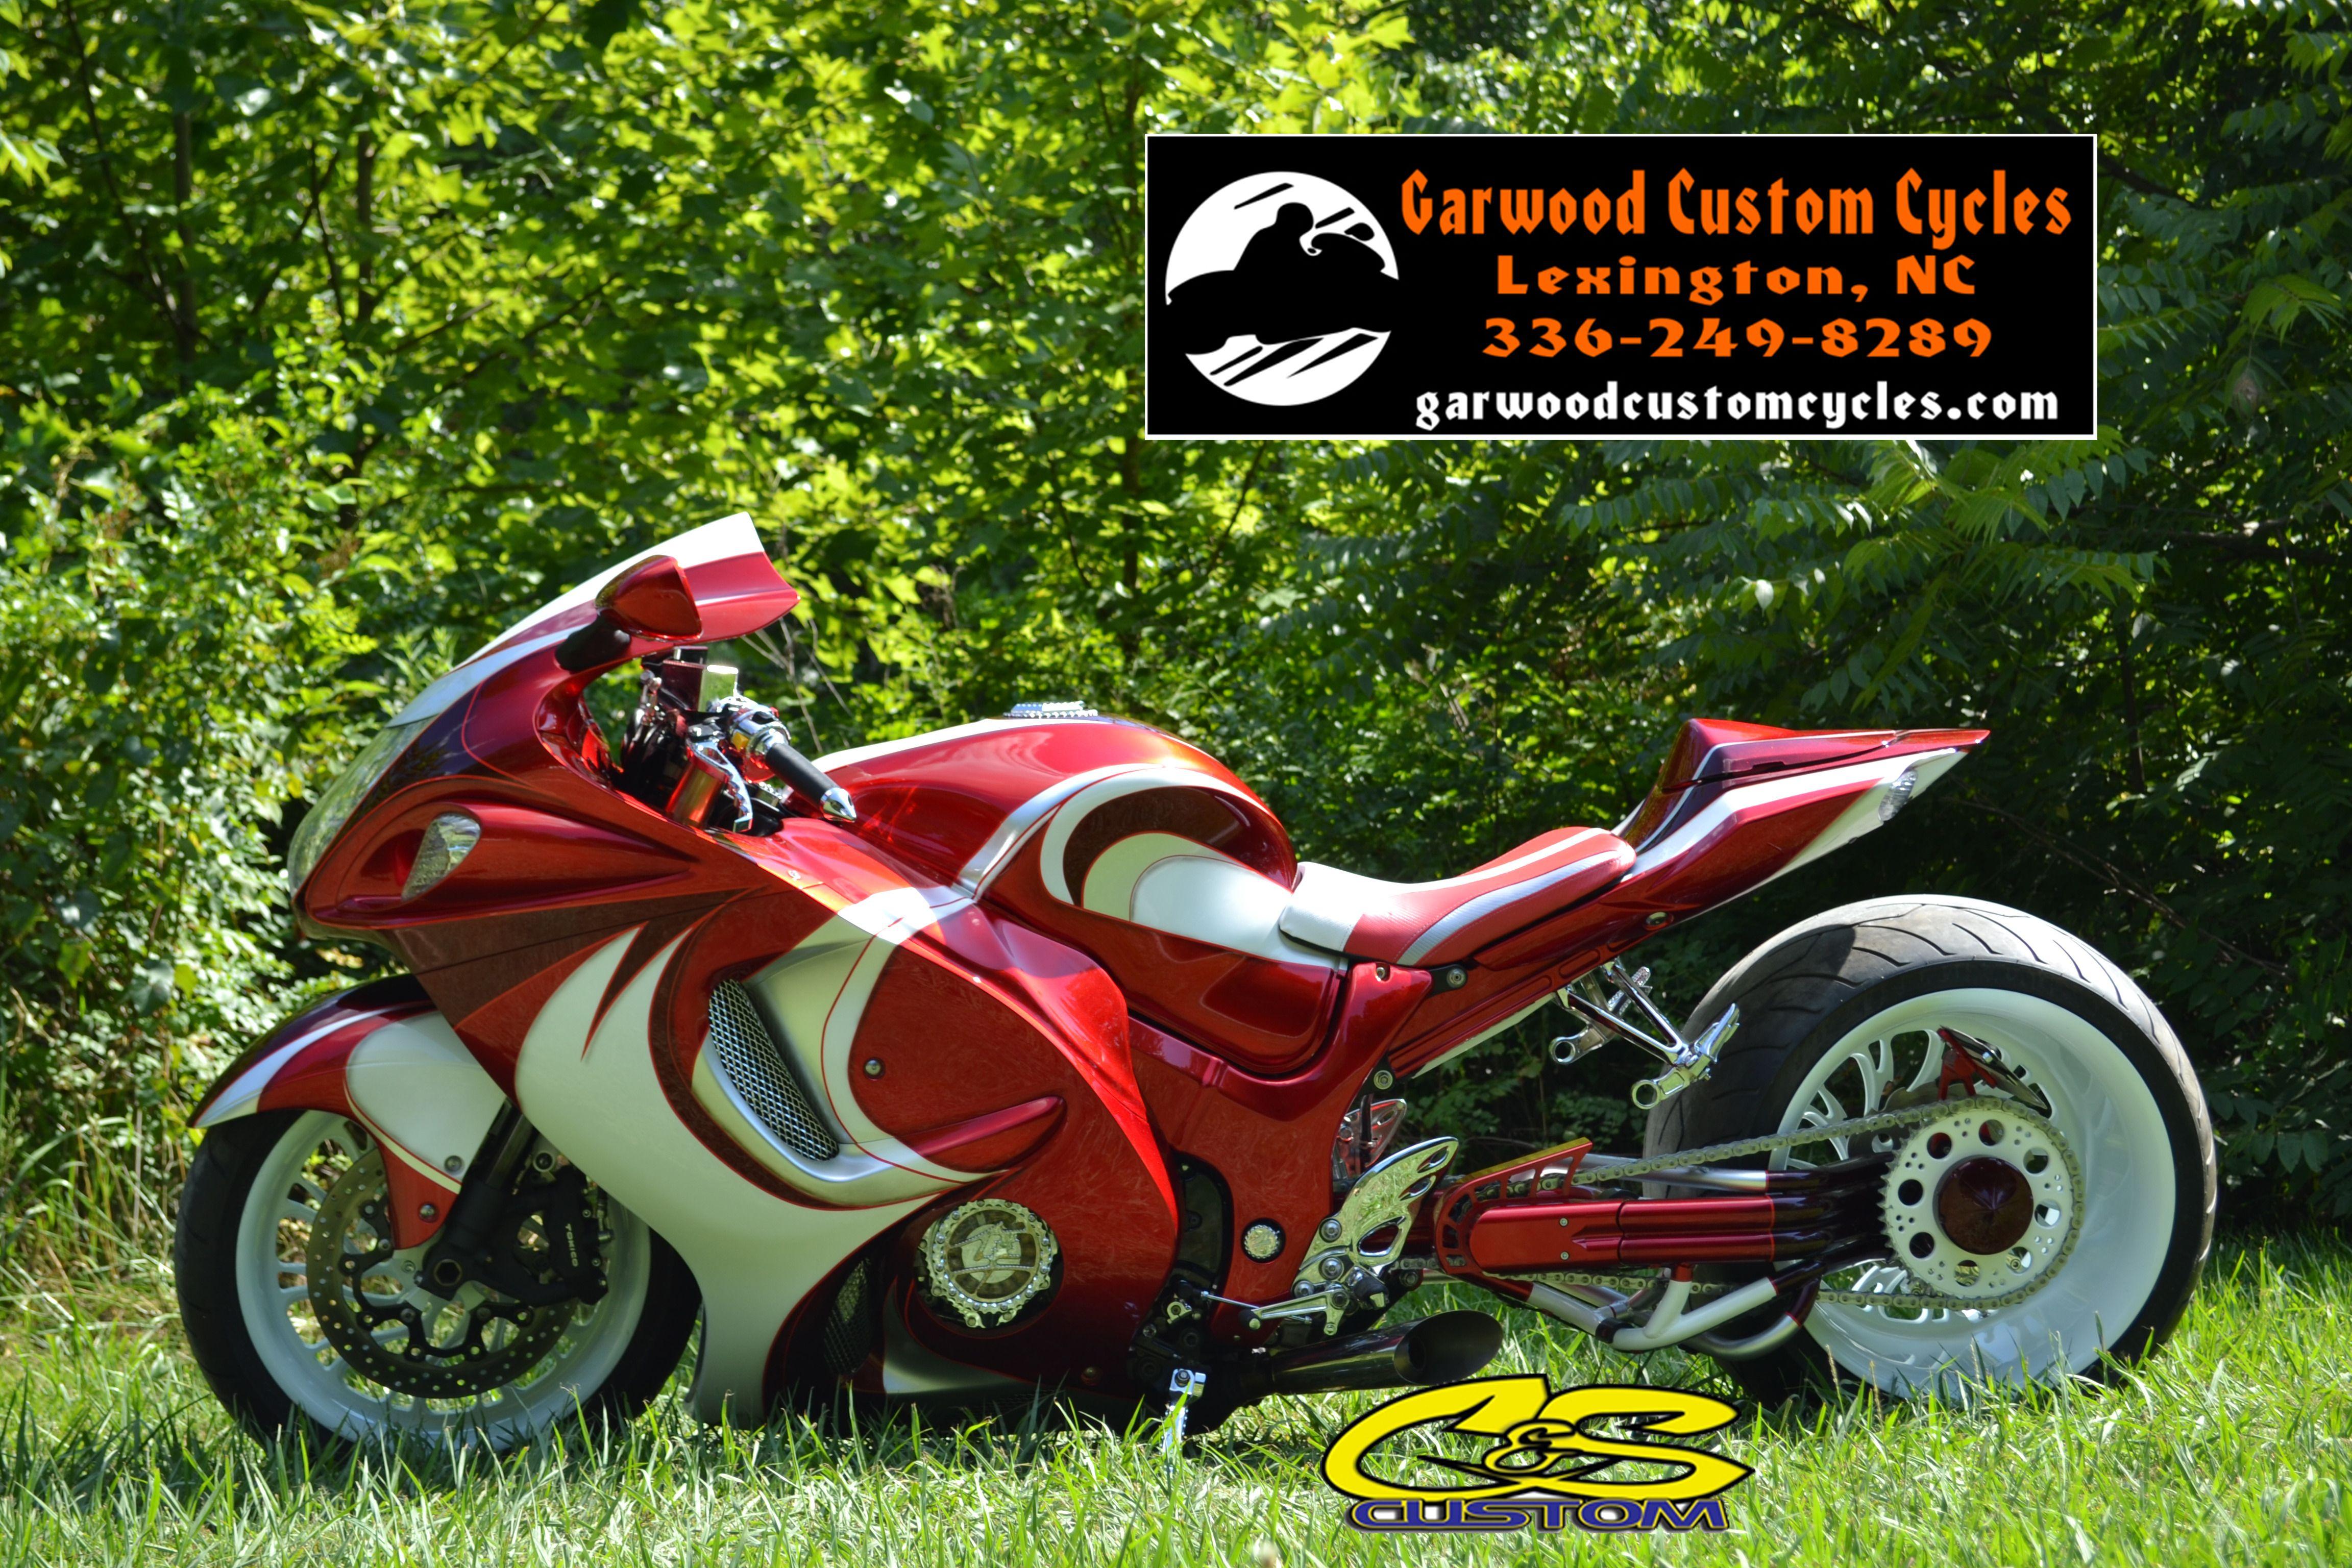 GCC Sportbike Motorcycle Motorbike Kawasaki zx14